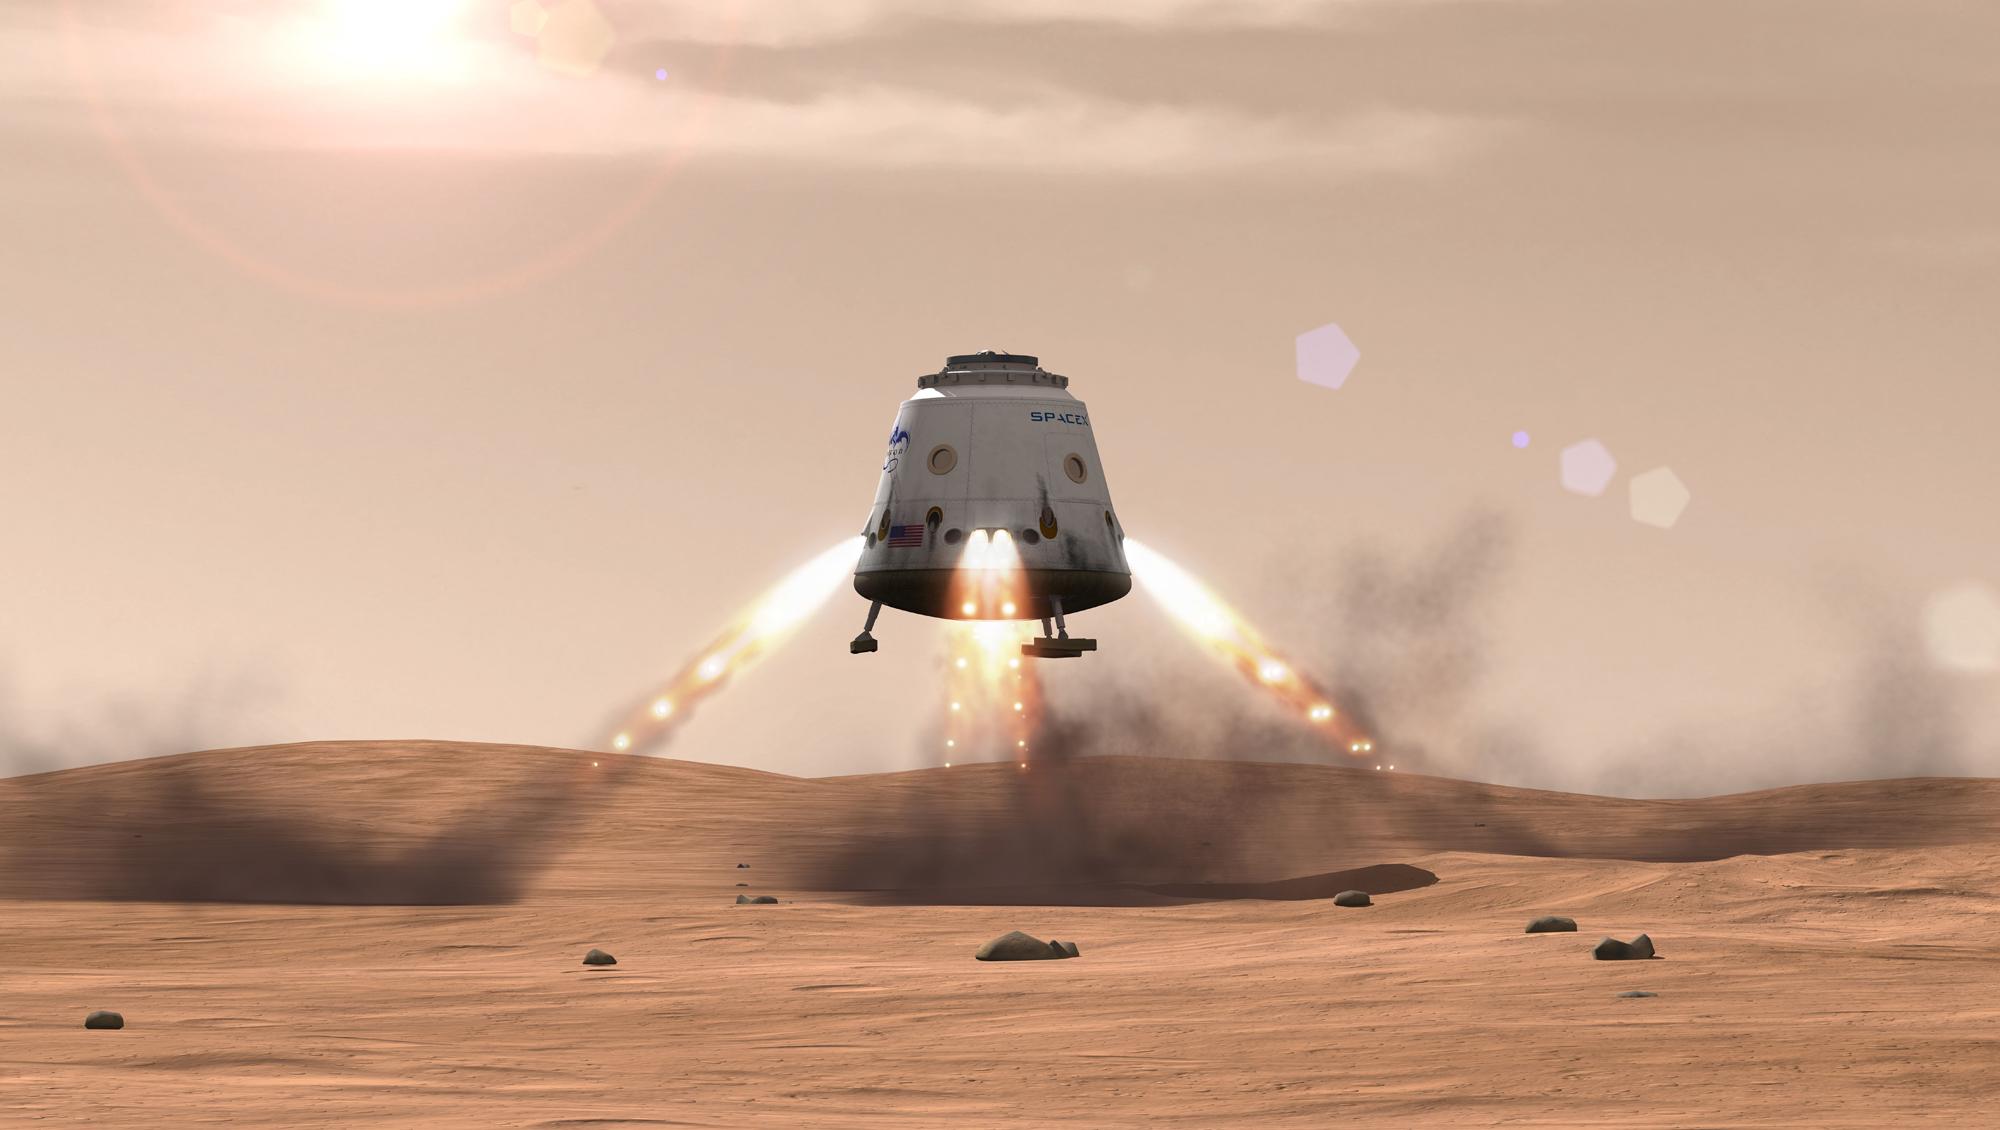 spacex-dragon-mars-landing.jpg?interpolation=lanczos-none&fit=inside 660:*